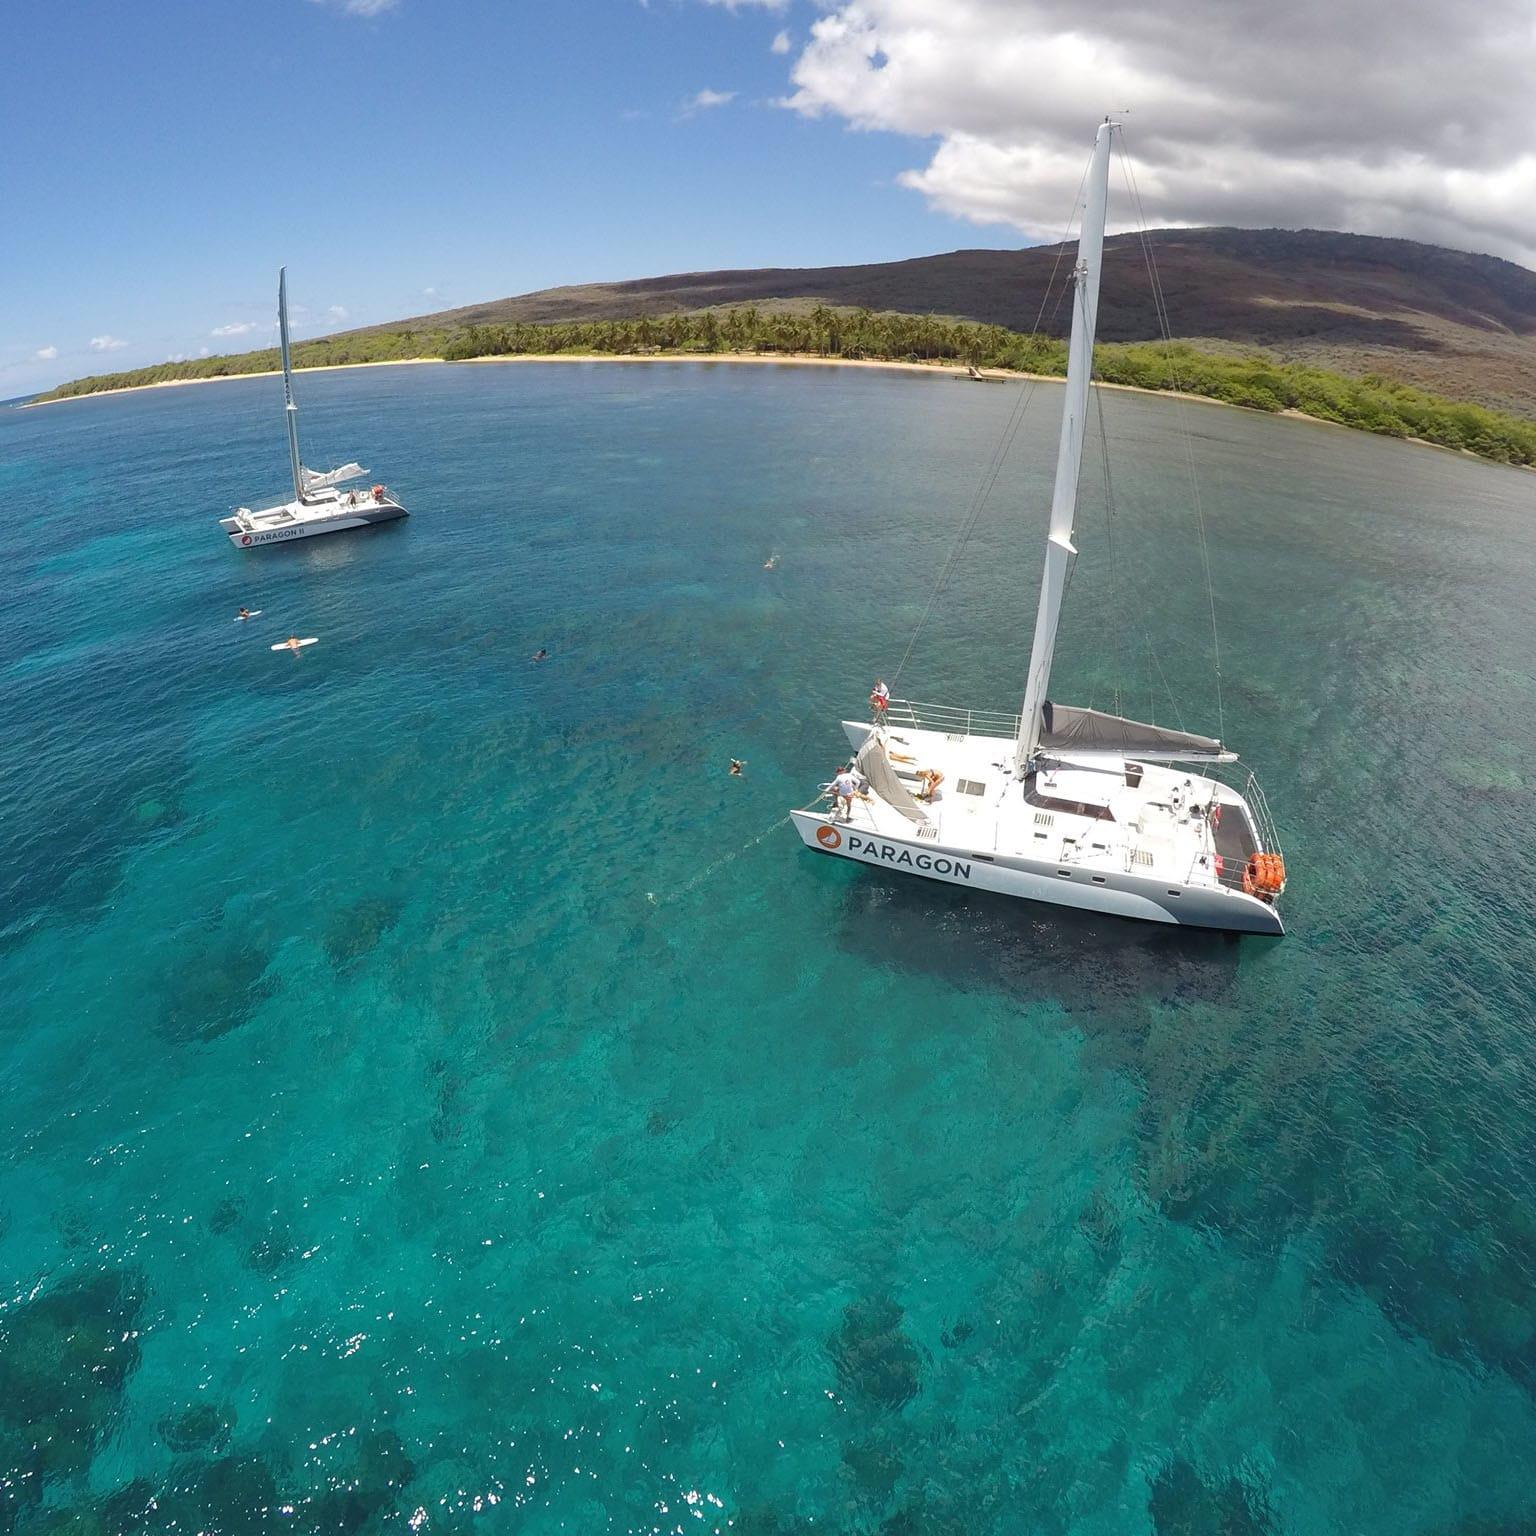 Paragon Sailing – Molokini Snorkeling